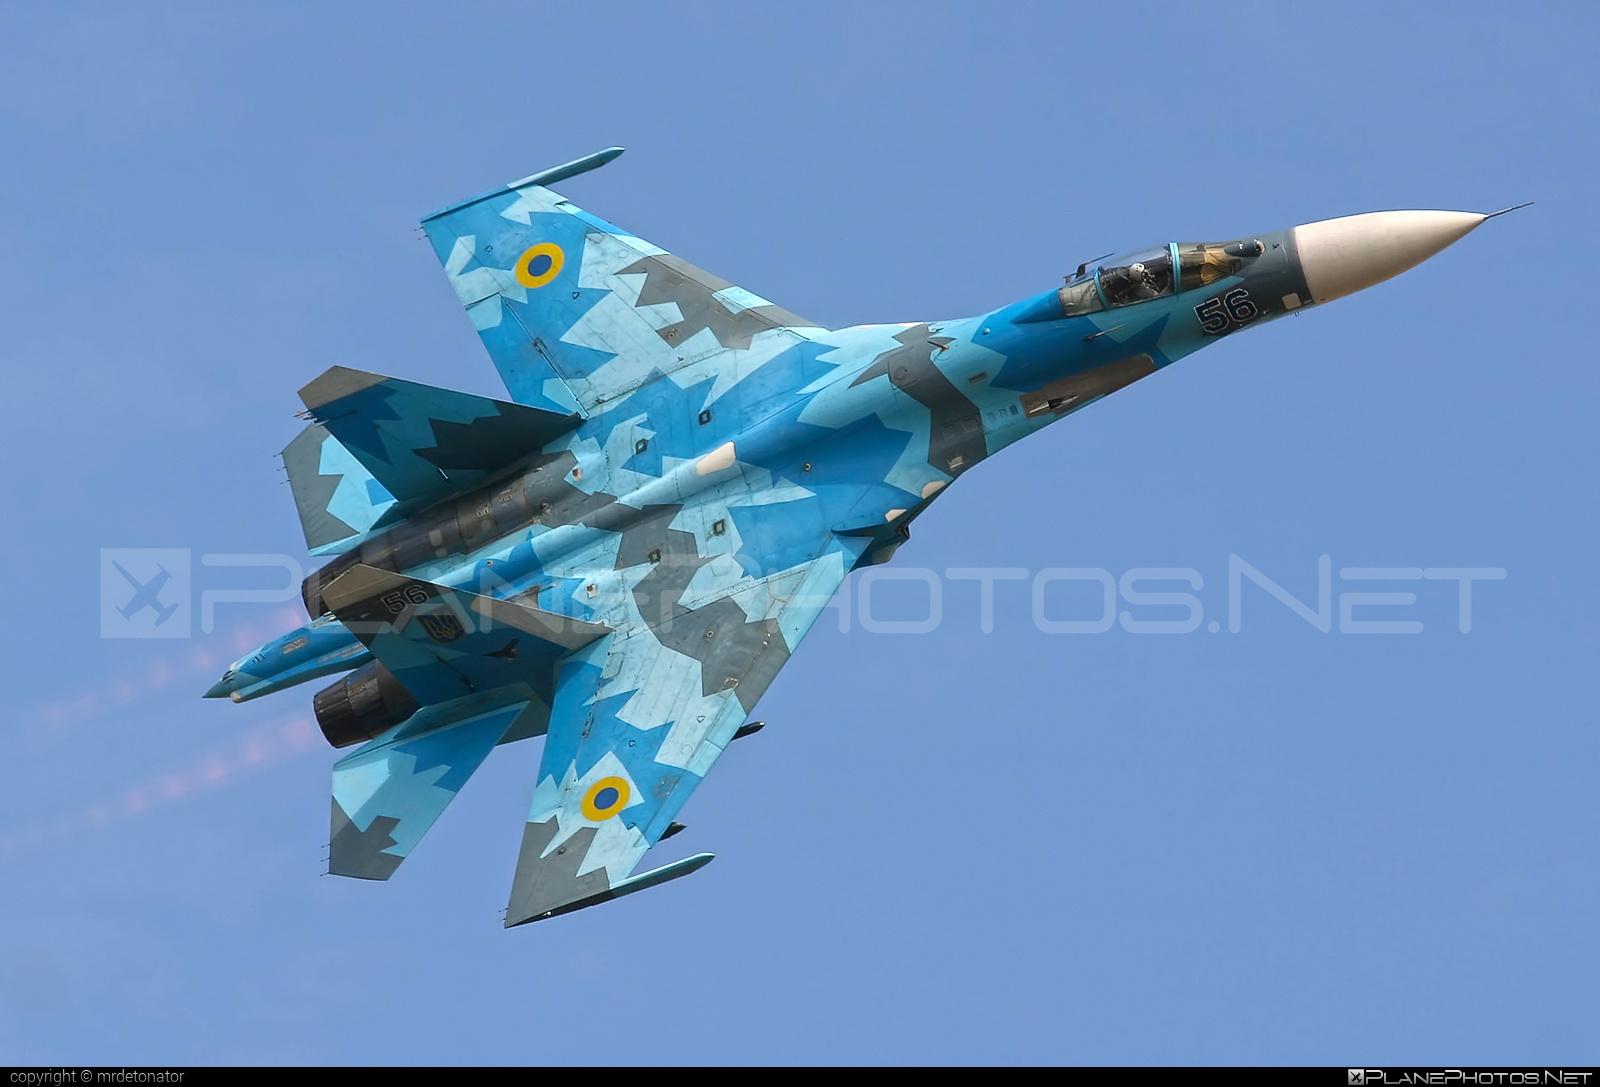 Sukhoi Su-27S - 56 operated by Povitryani Syly Ukrayiny (Ukrainian Air Force) #povitryanisylyukrayiny #su27 #su27s #sukhoi #sukhoi27 #ukrainianairforce